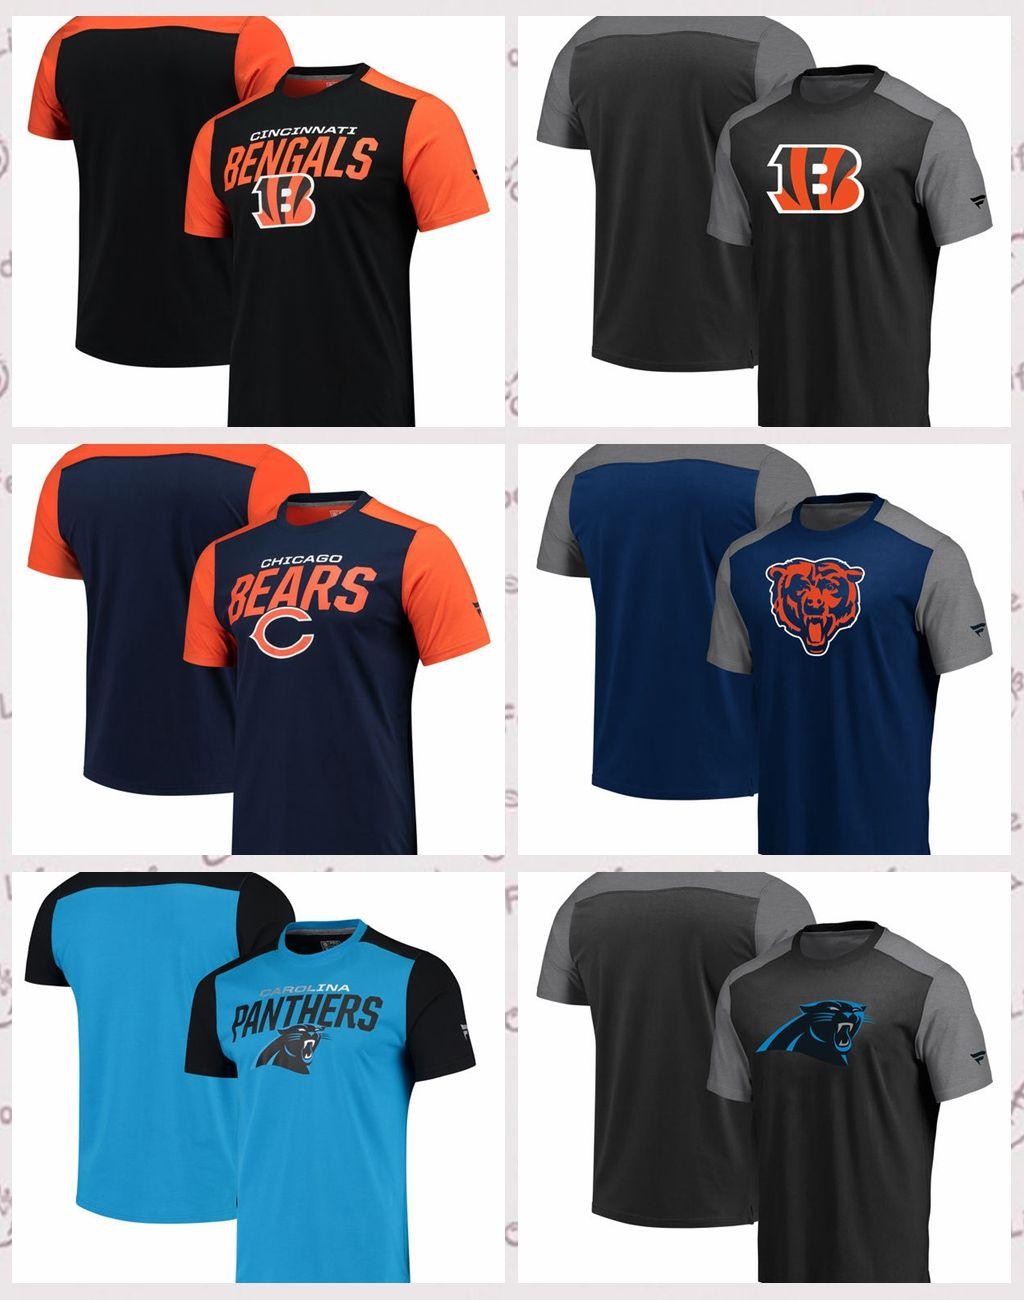 538d8c51825 Cincinnati Bengals Carolina Panthers Chicago Bears Pro Line by ...